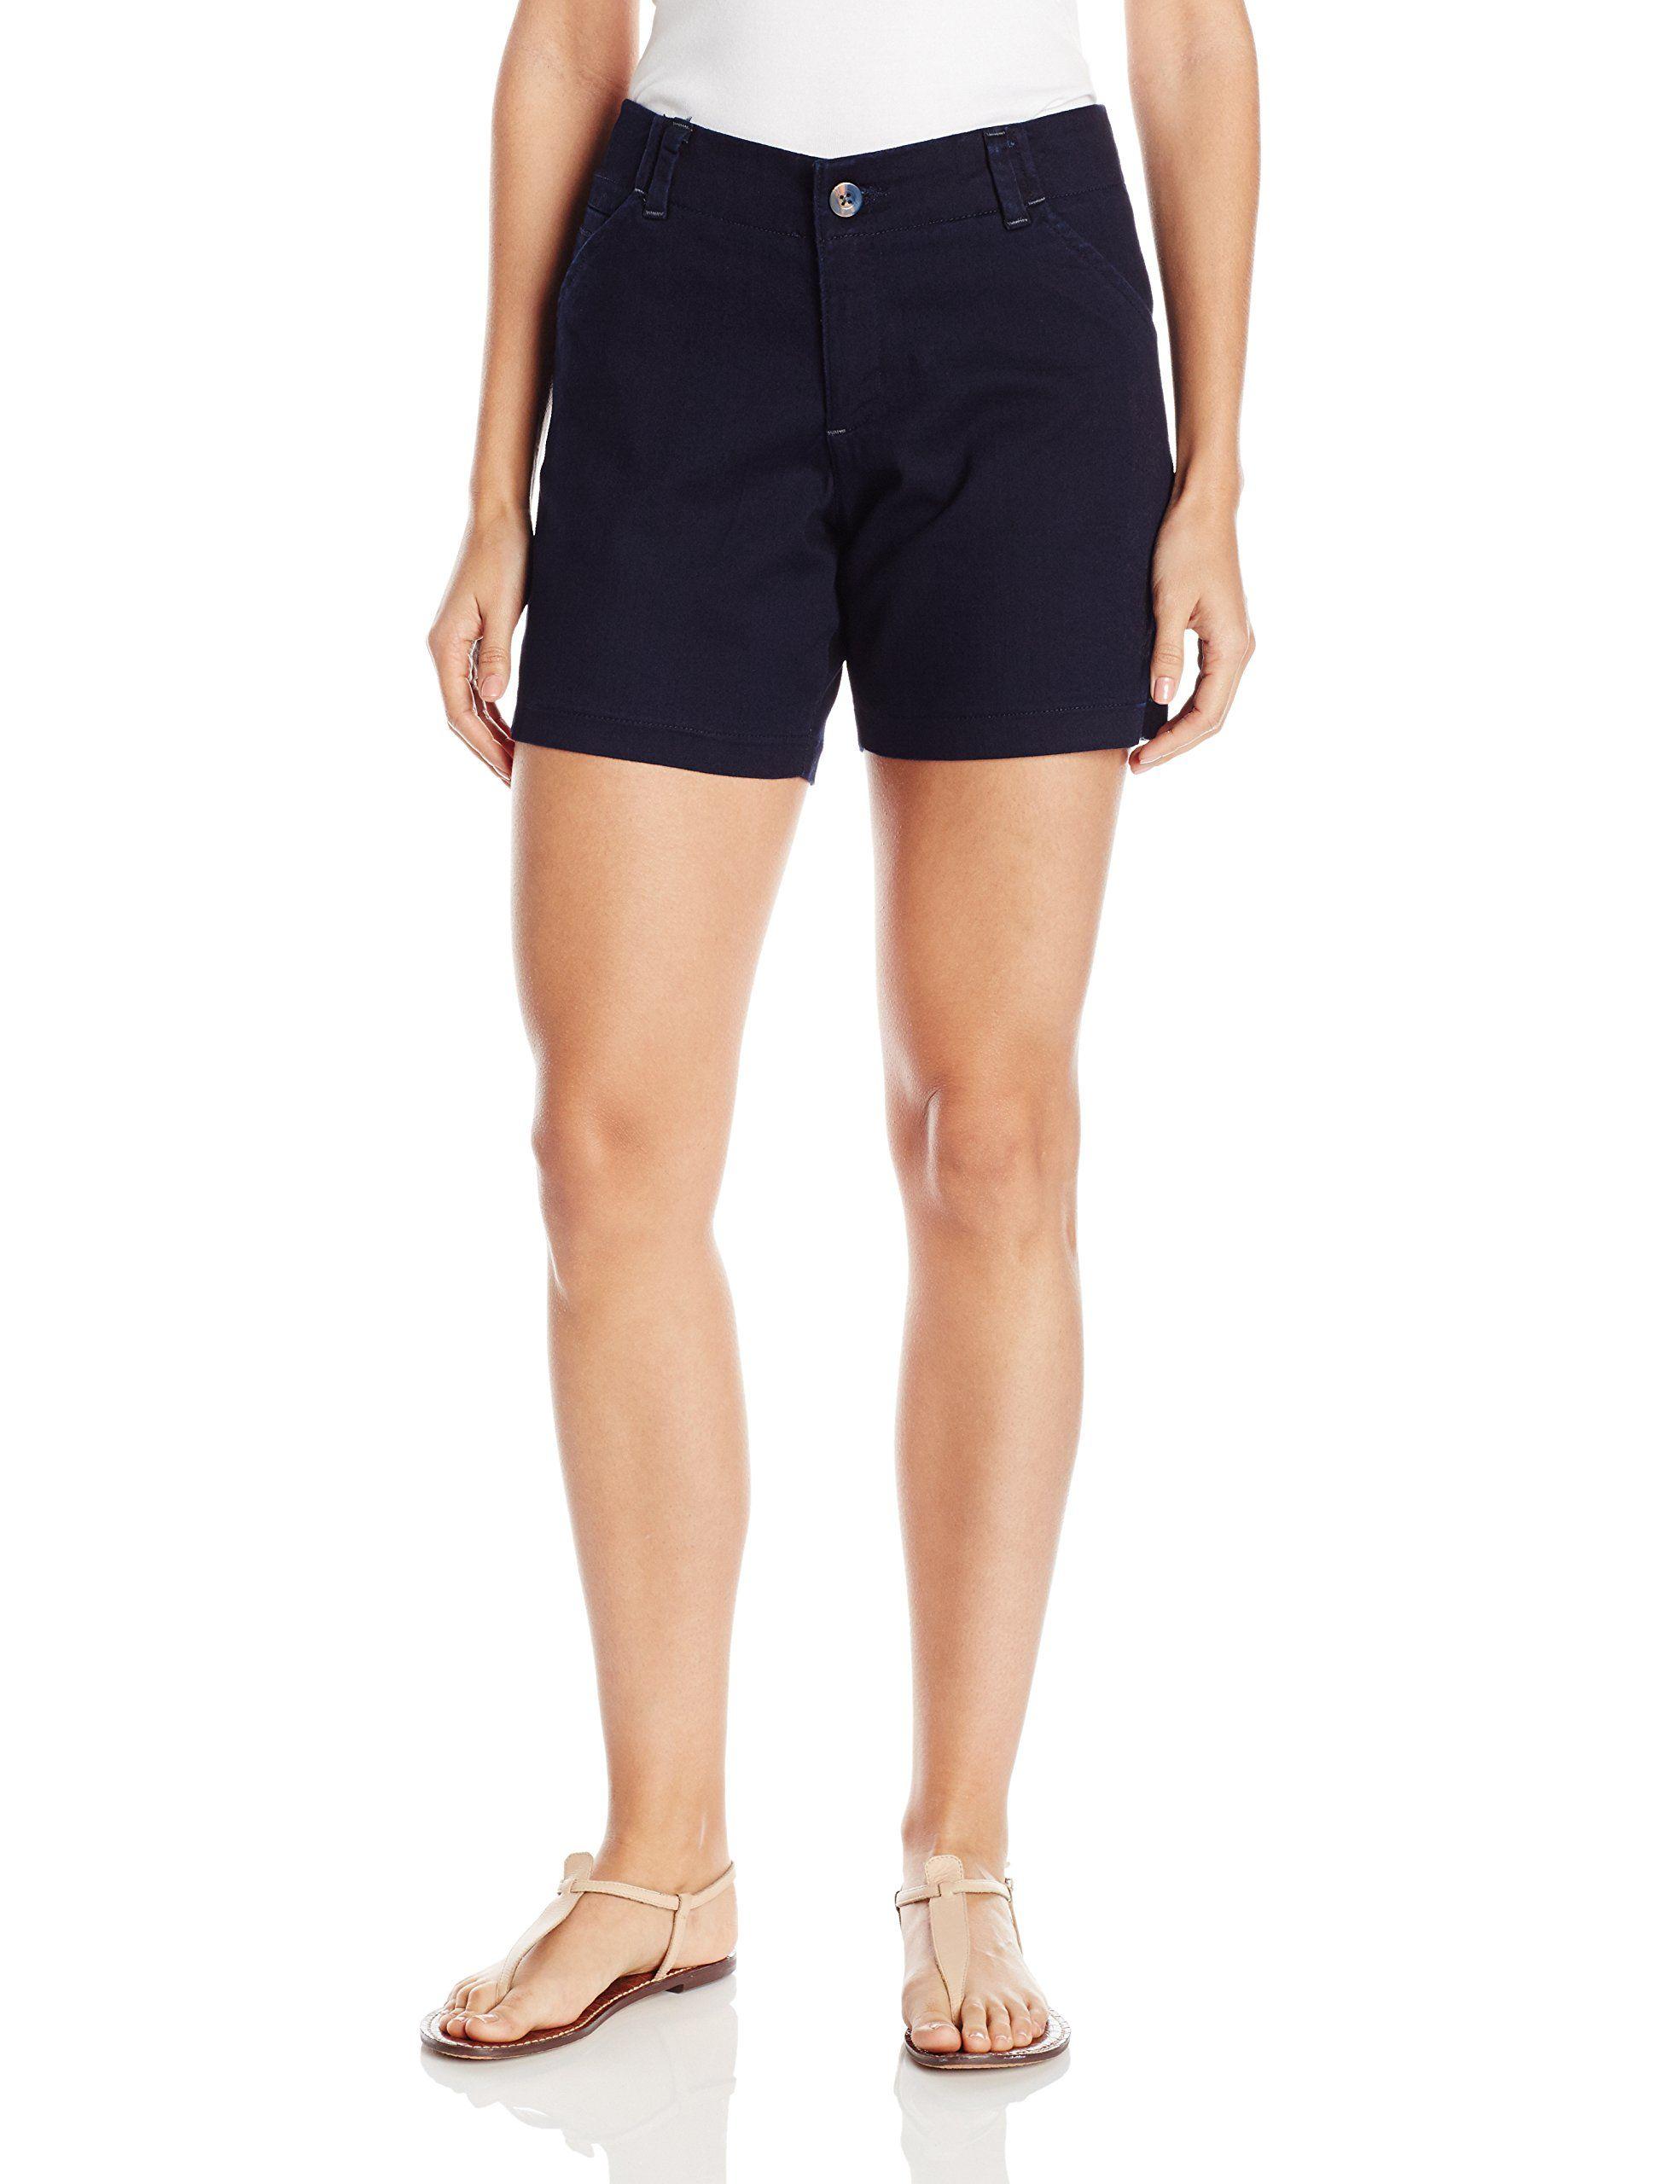 Lee Women's Plus Size Midrise Fit Essential Chino Short, Twilight, 22W/Medium